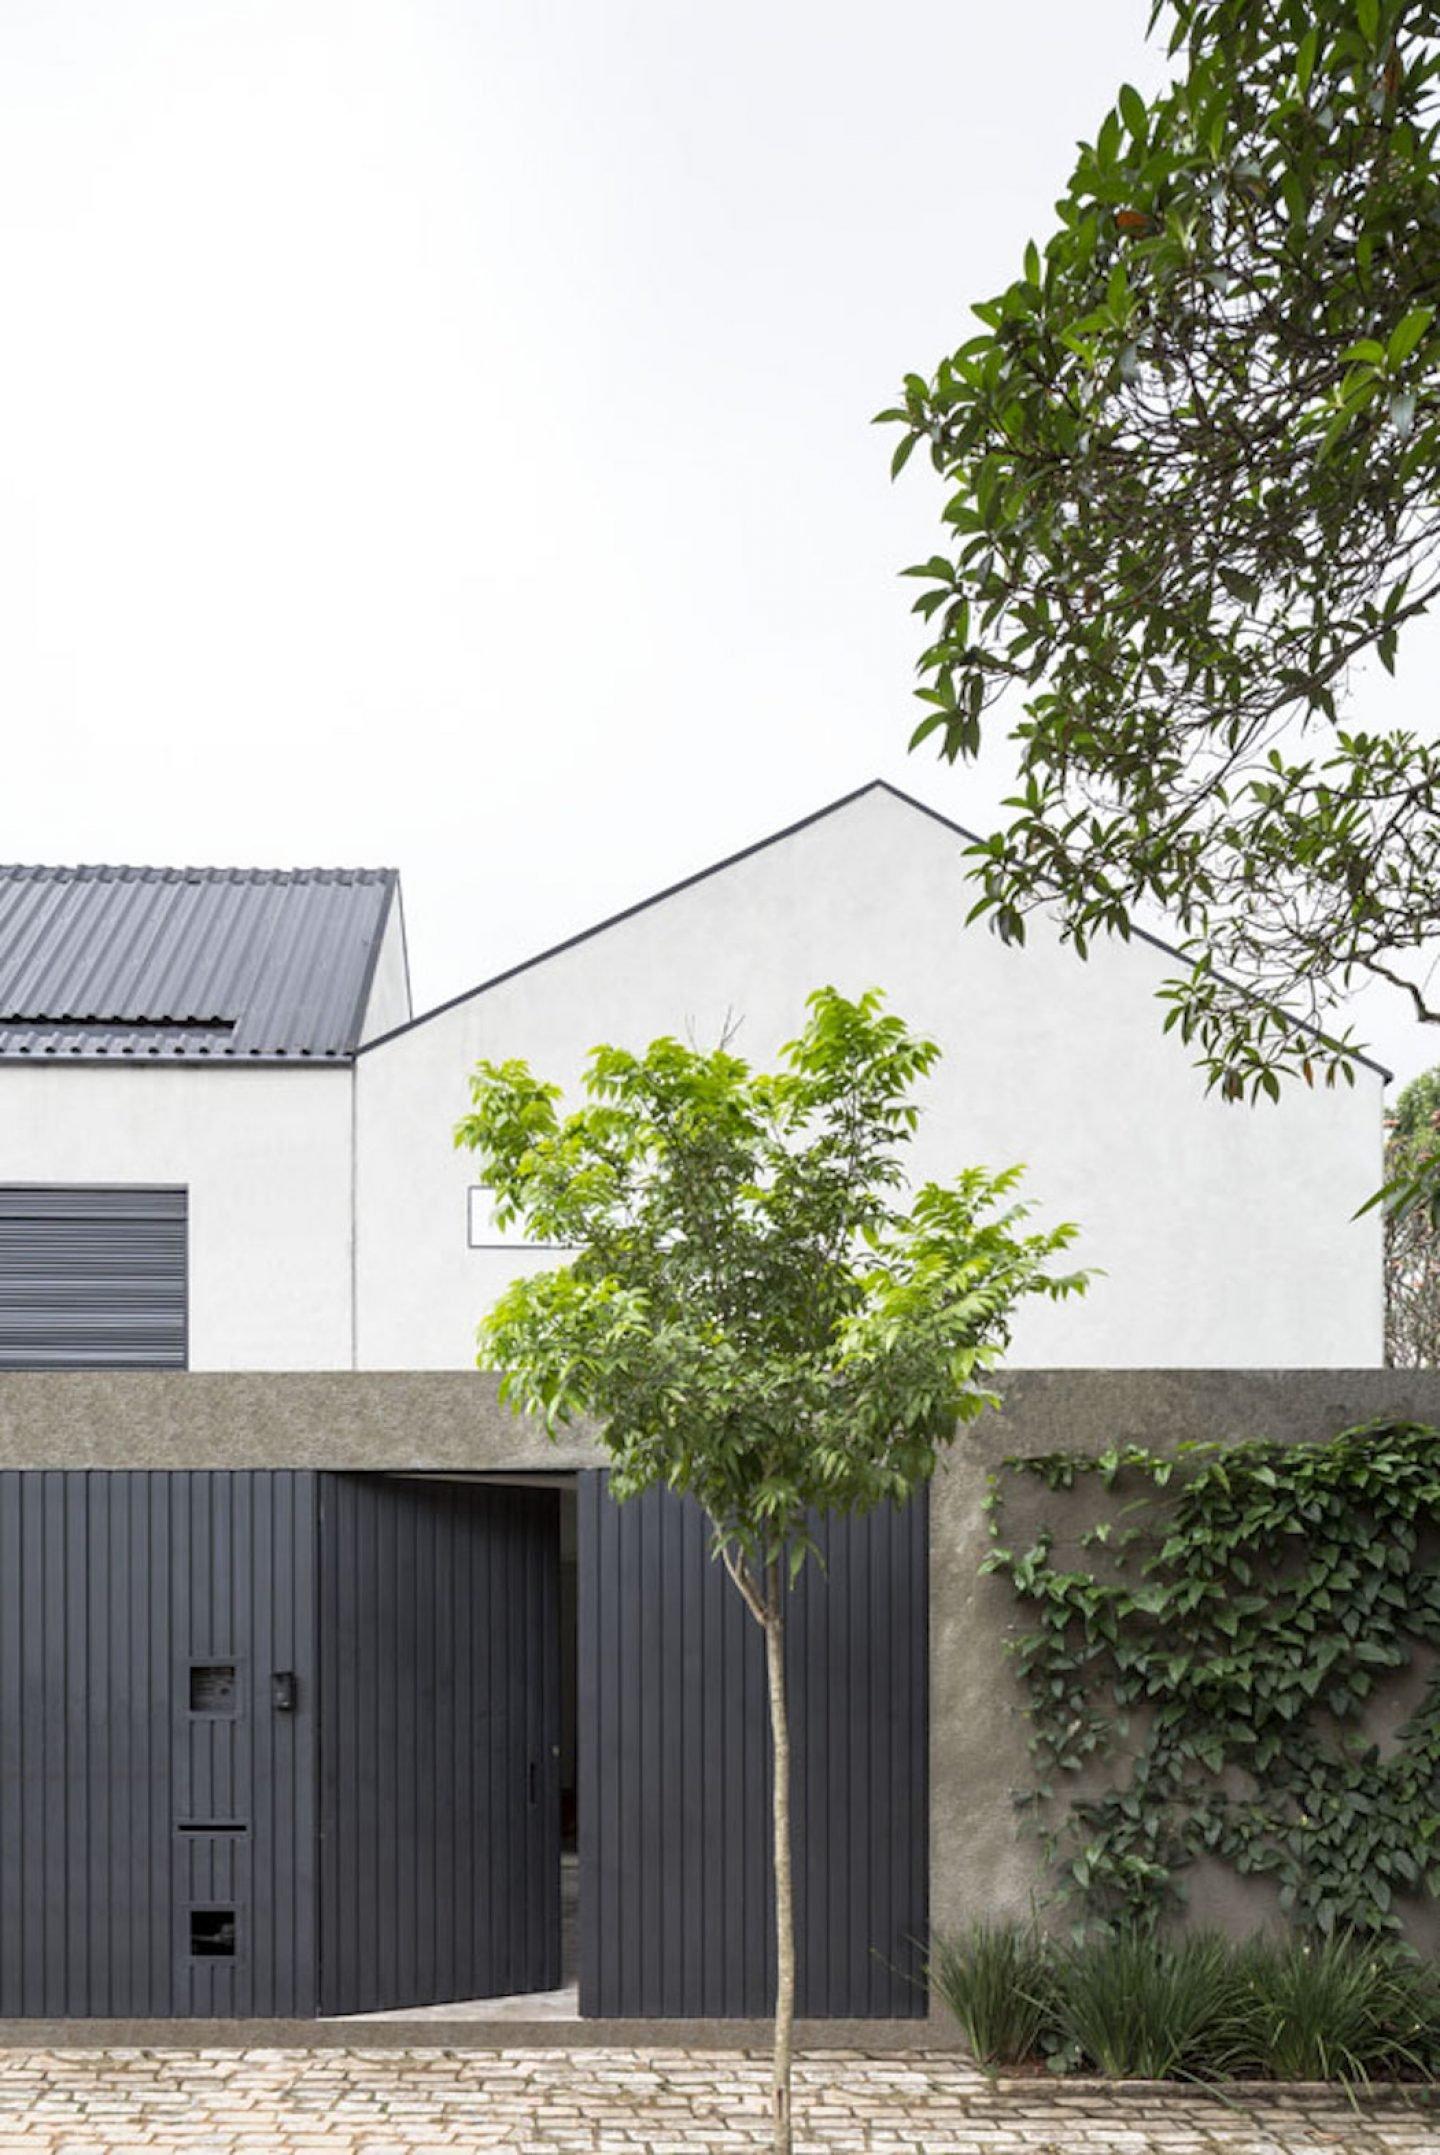 Felipe_Hess_Architecture_9308